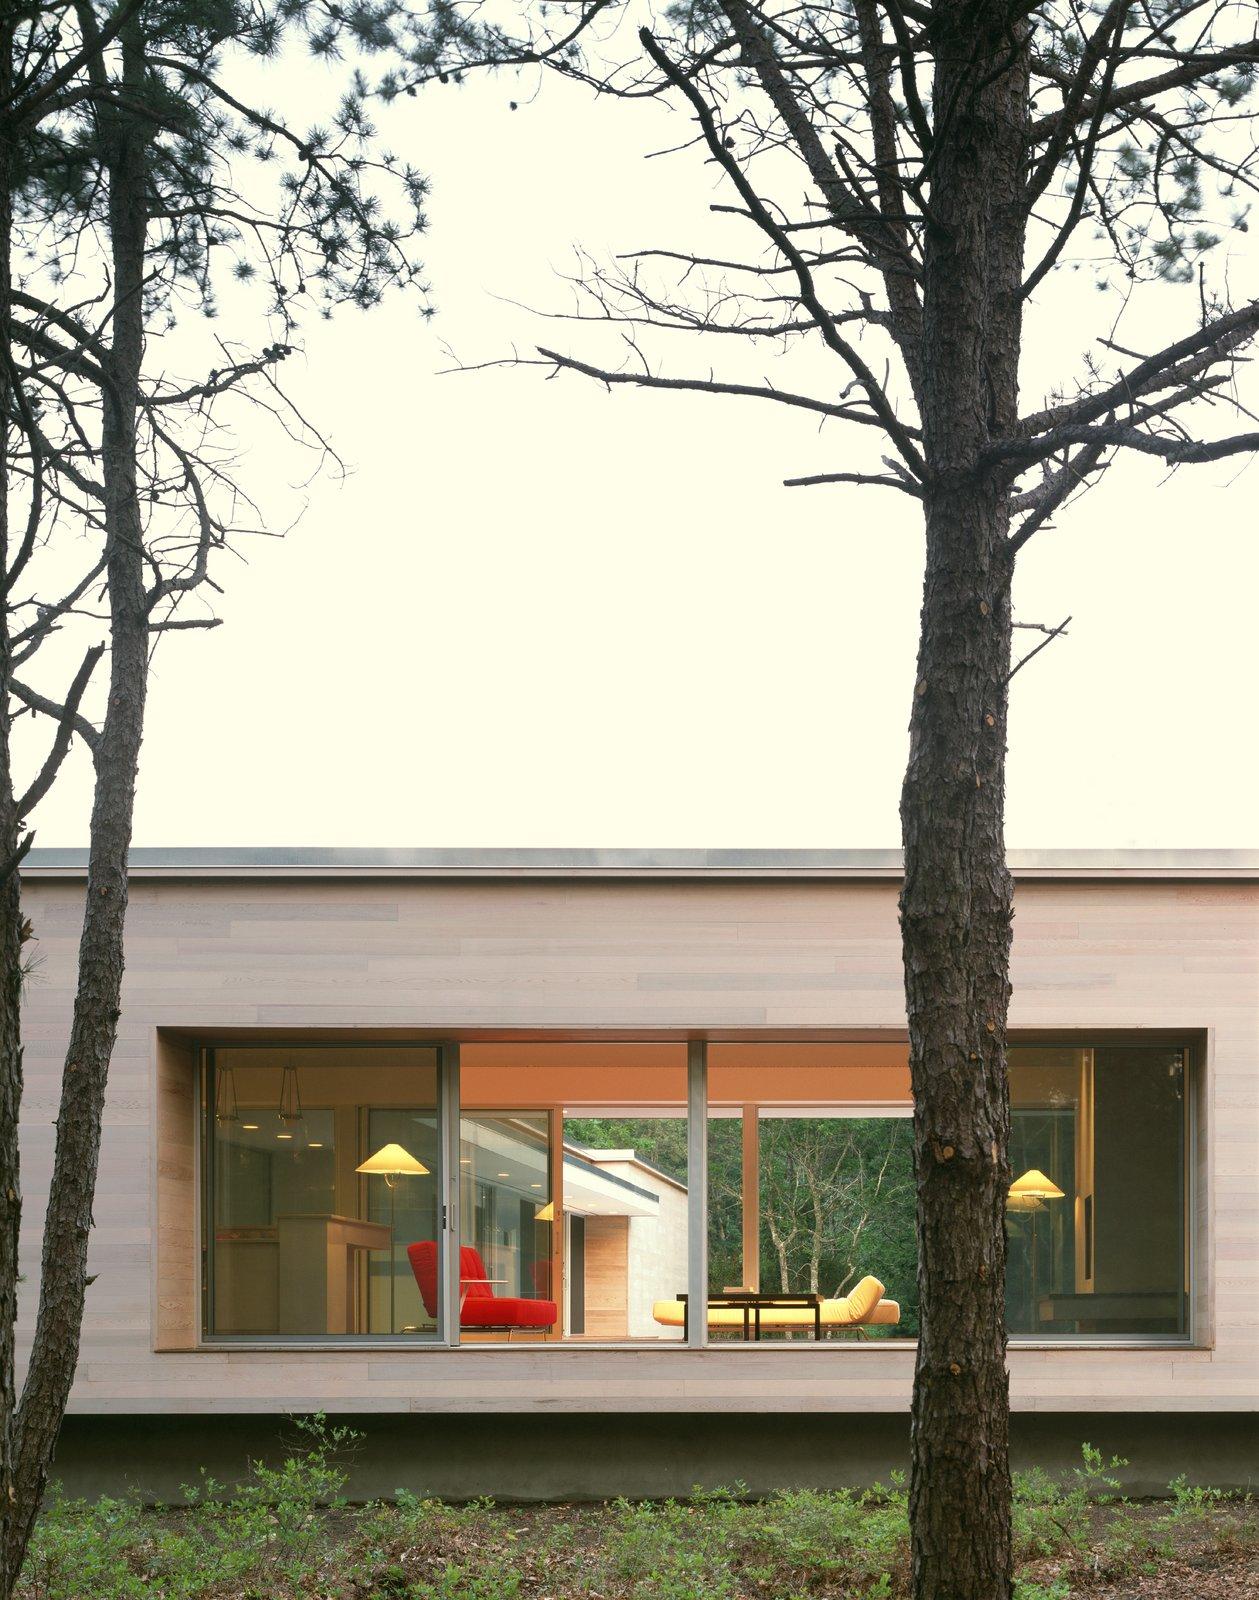 Sagaponac House by Hariri & Hariri Architecture